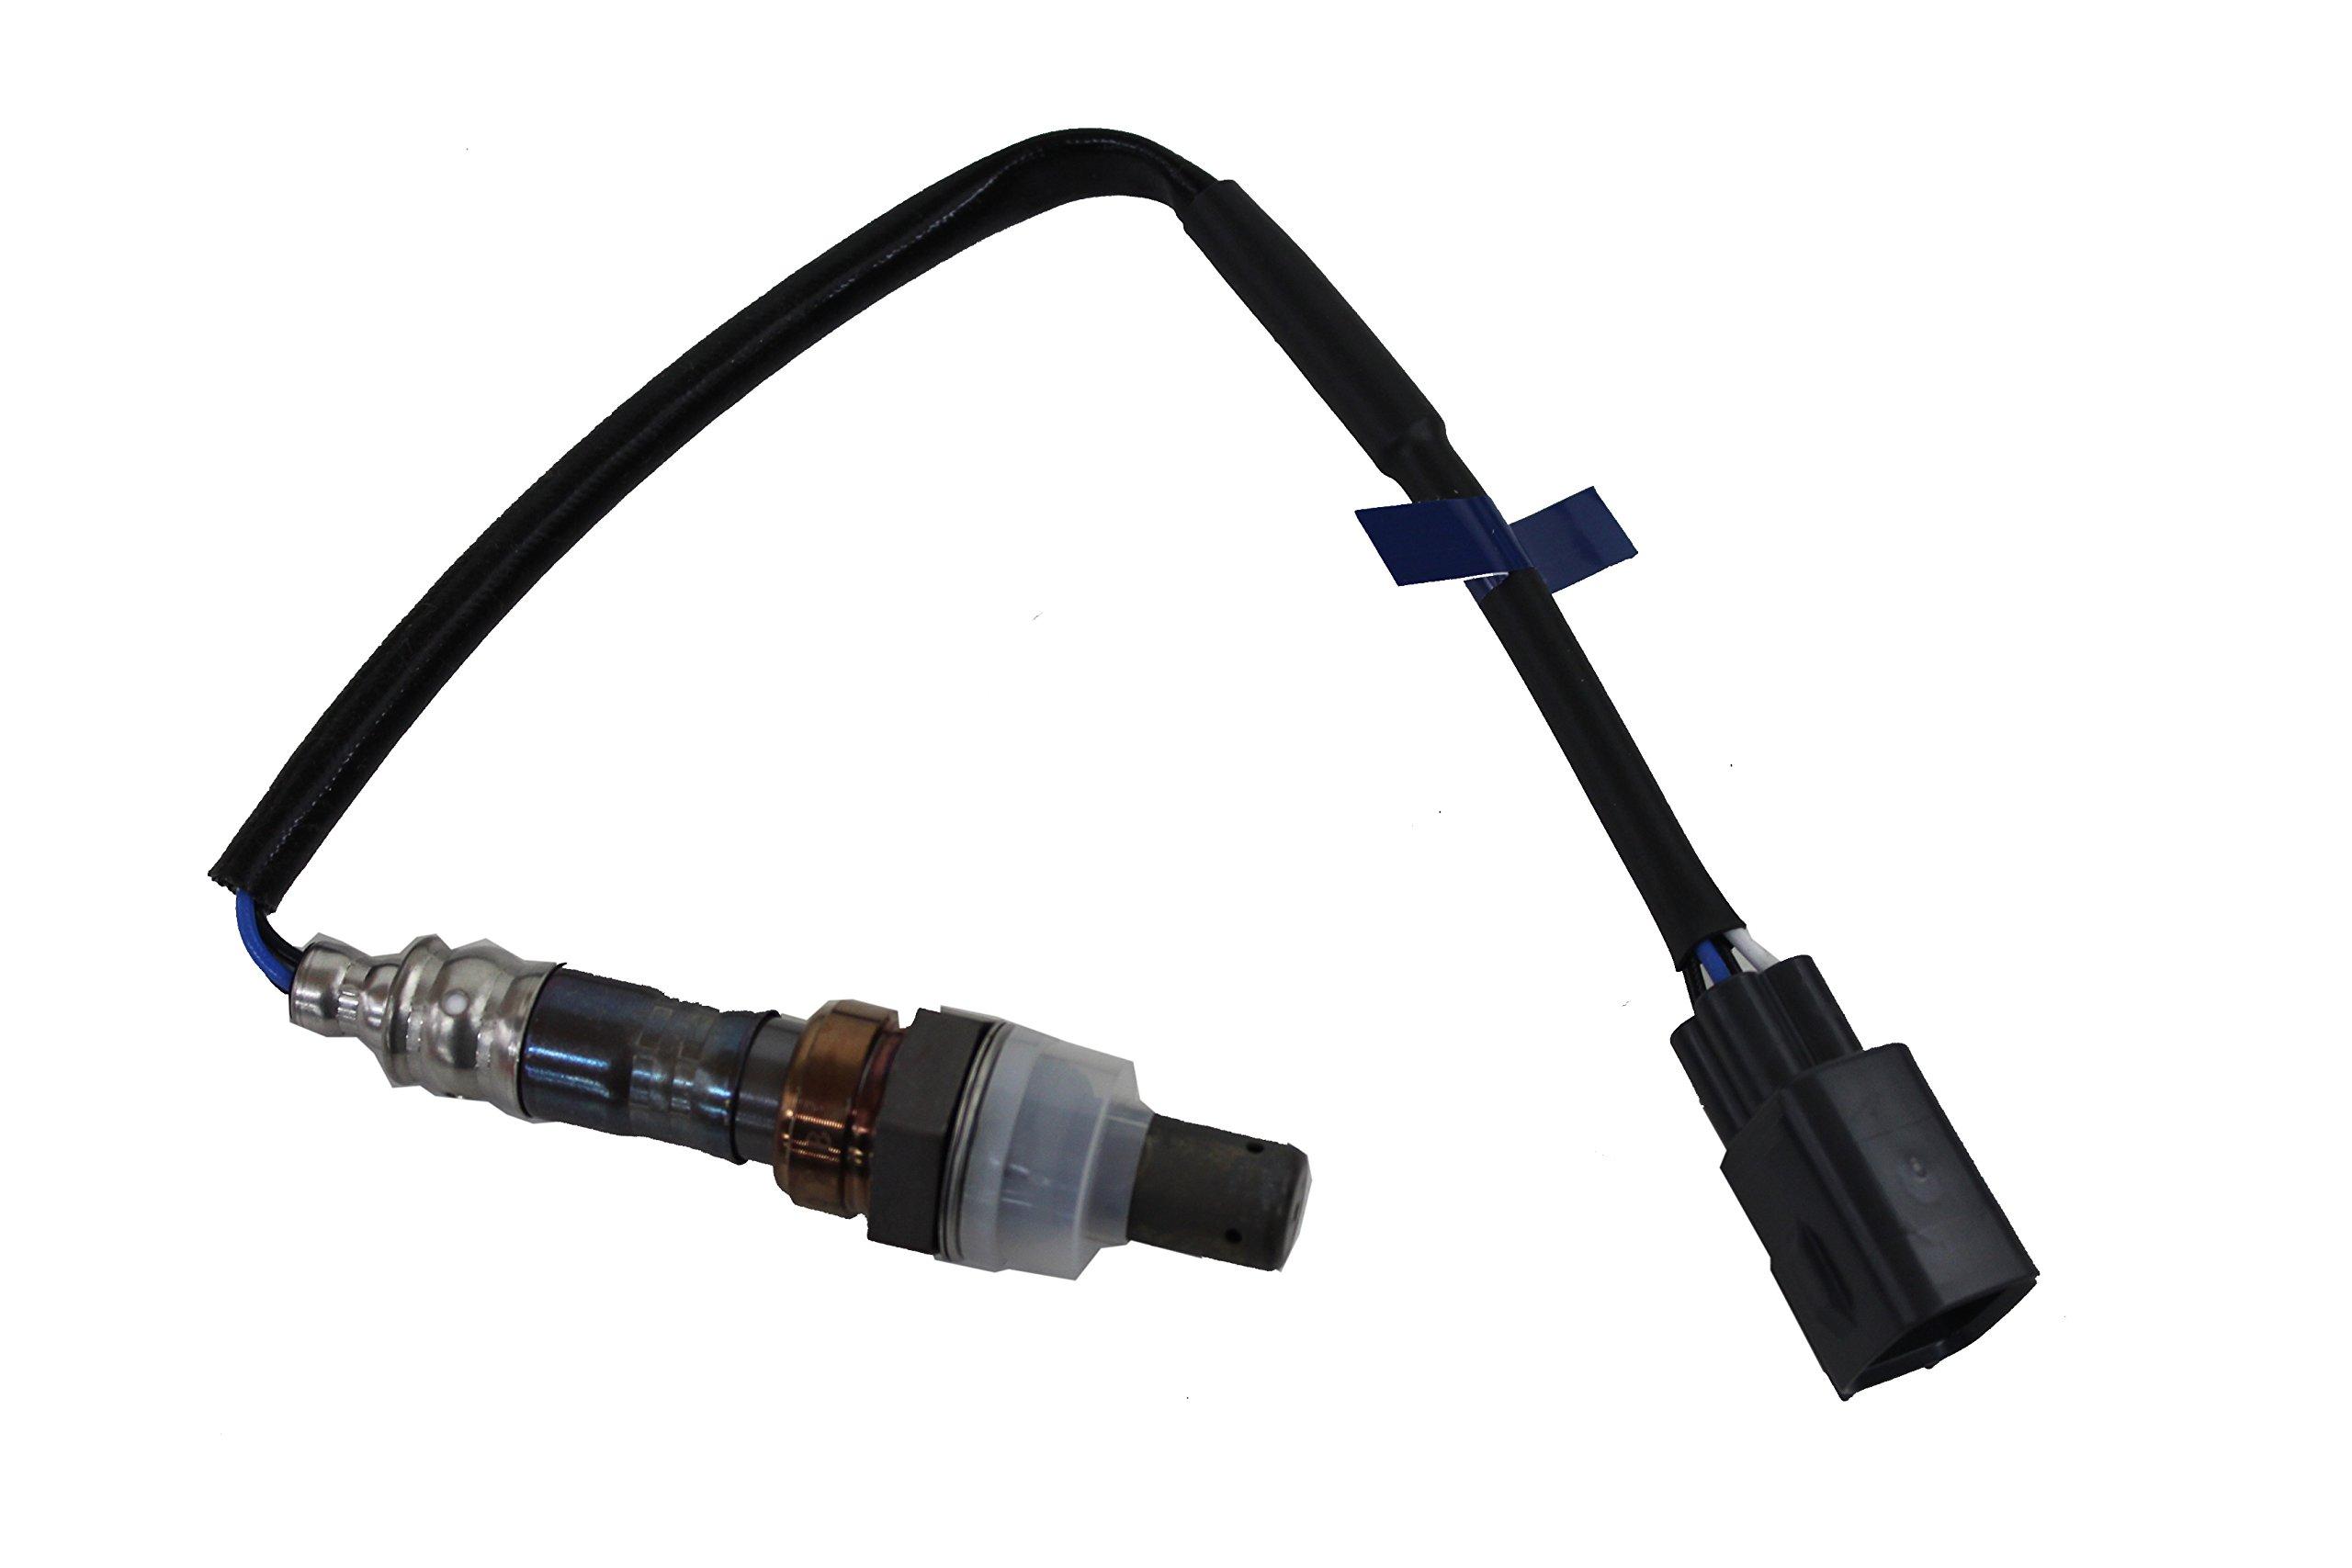 2003 Lexus Gs300 Bank 1 Sensor Car Codep1135 A F Heater Circuit Malfunction Air Fuel Ratio Afr 234 9043 Upstream Front Oxygen